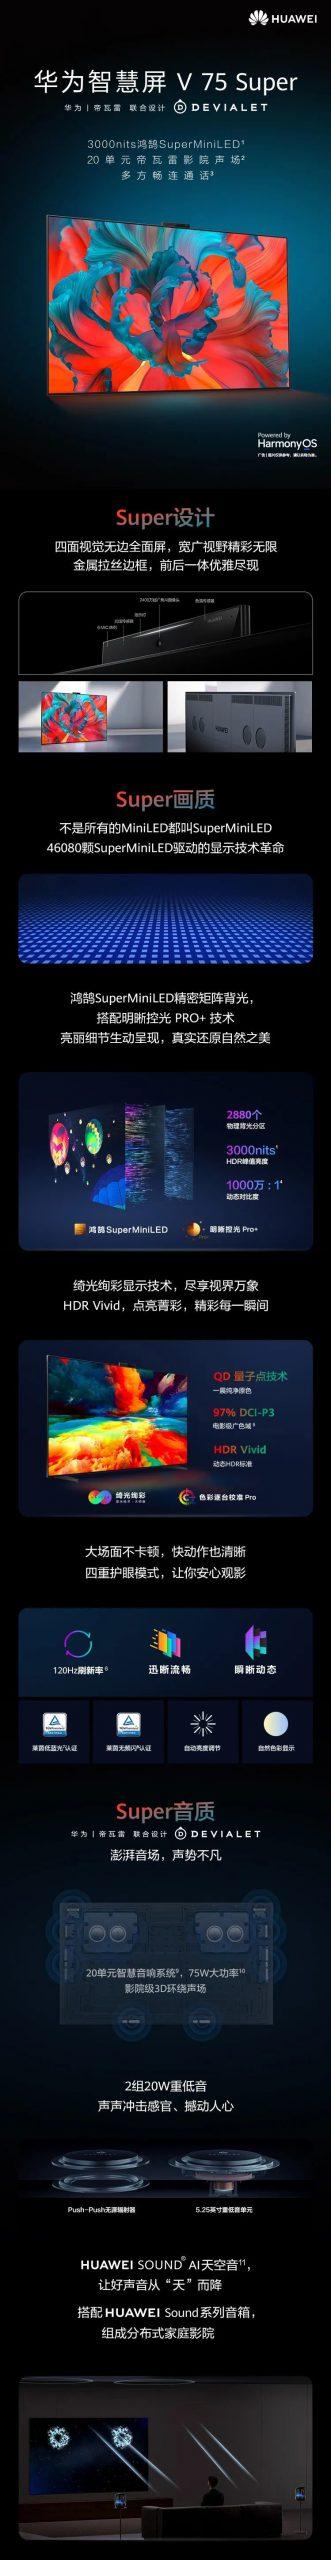 Huawei Smart Screen V75 Super Vivid